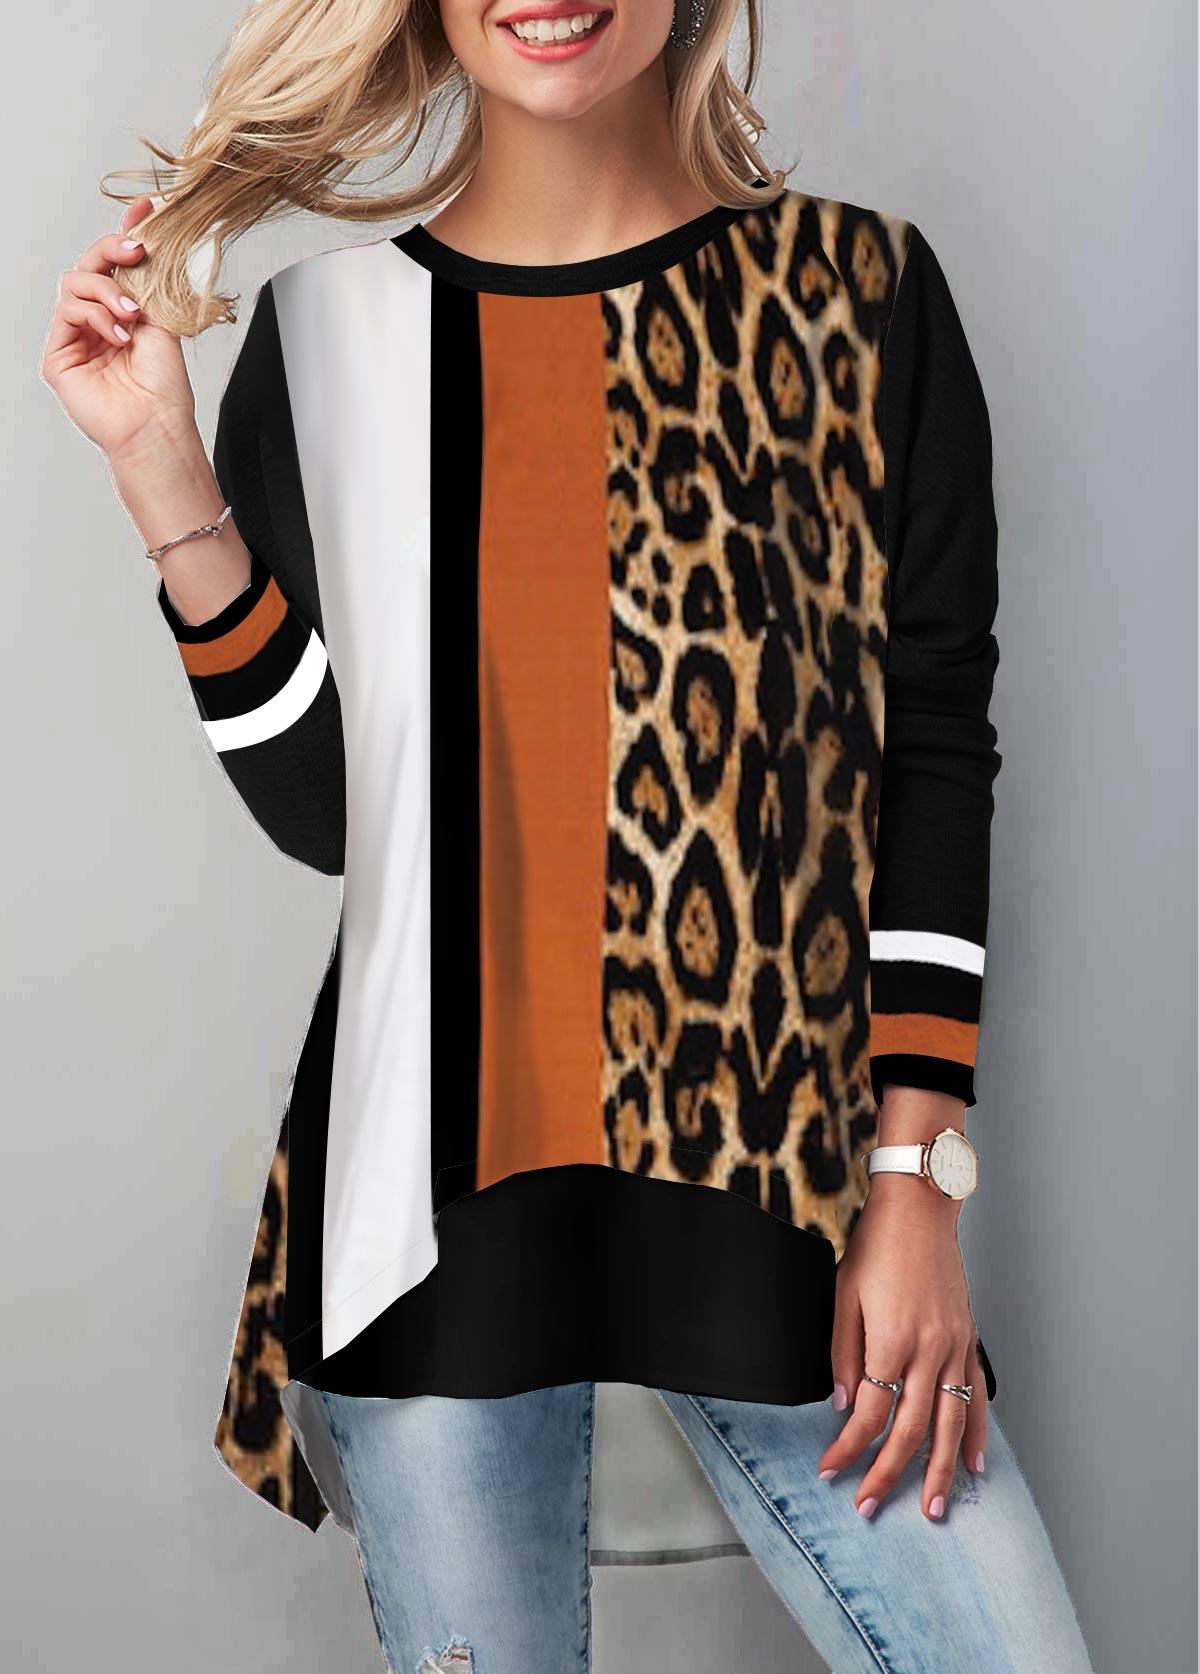 Leopard Print Round Neck Long Sleeve T Shirt